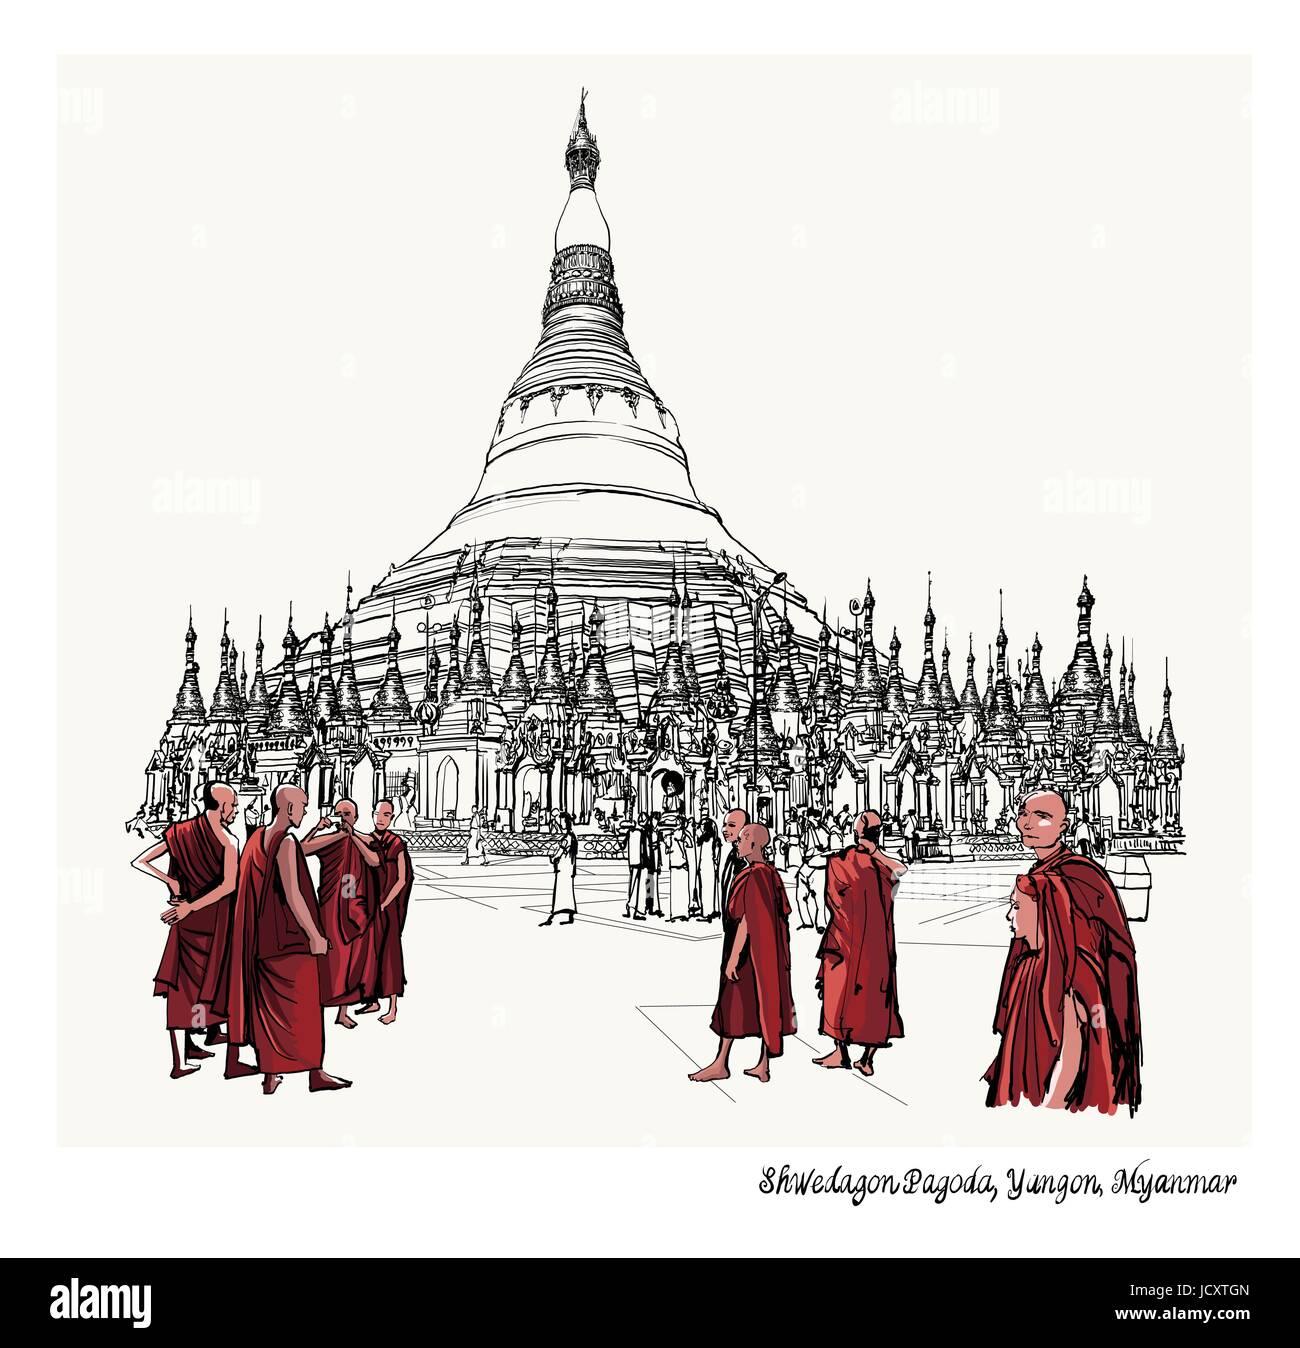 Yangon, Myanmar view of Shwedagon Pagoda - vector illustration - Stock Vector